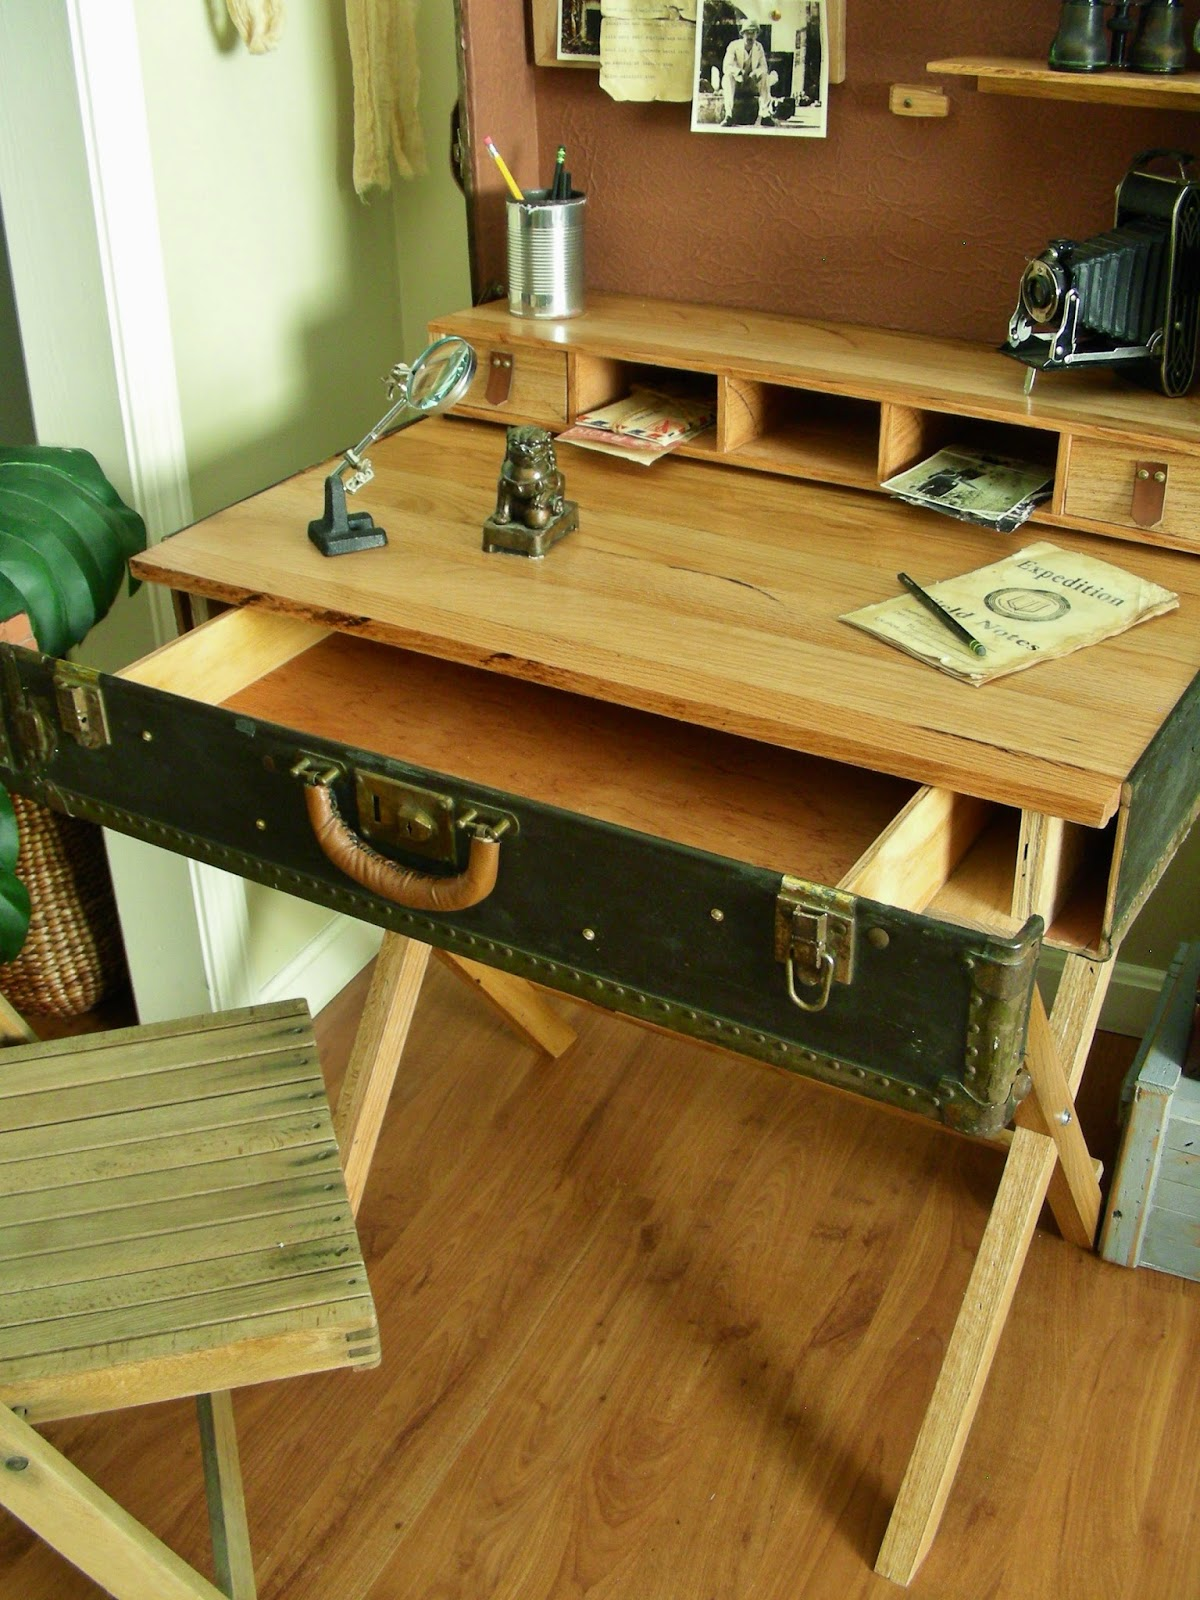 Destinations Vintage Upcycled Amp Repurposed Stuff